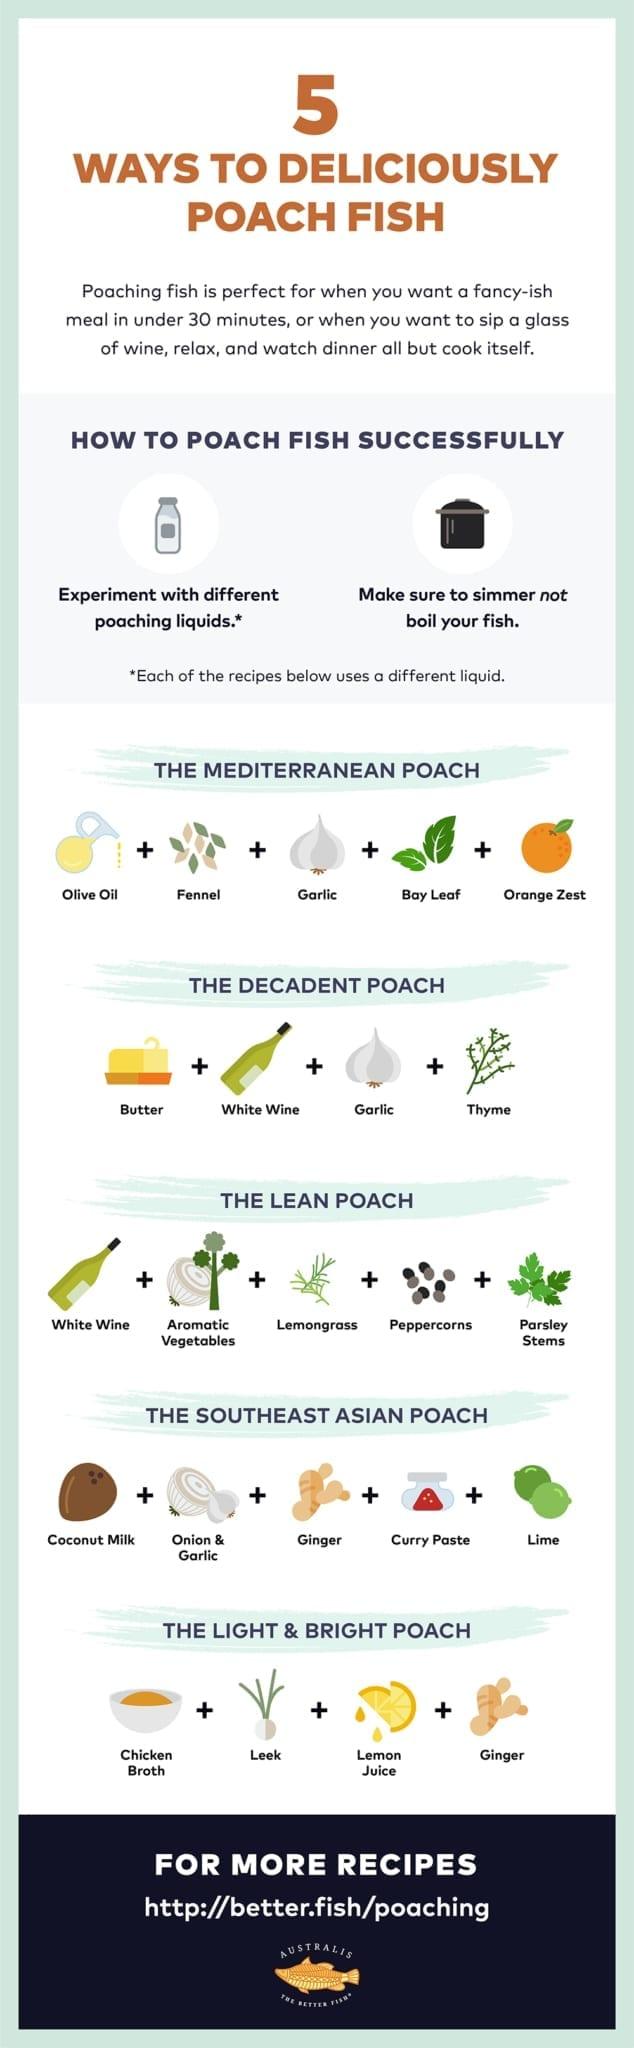 Australis Barramundi - 5 Ways to Deliciously Poach Fish